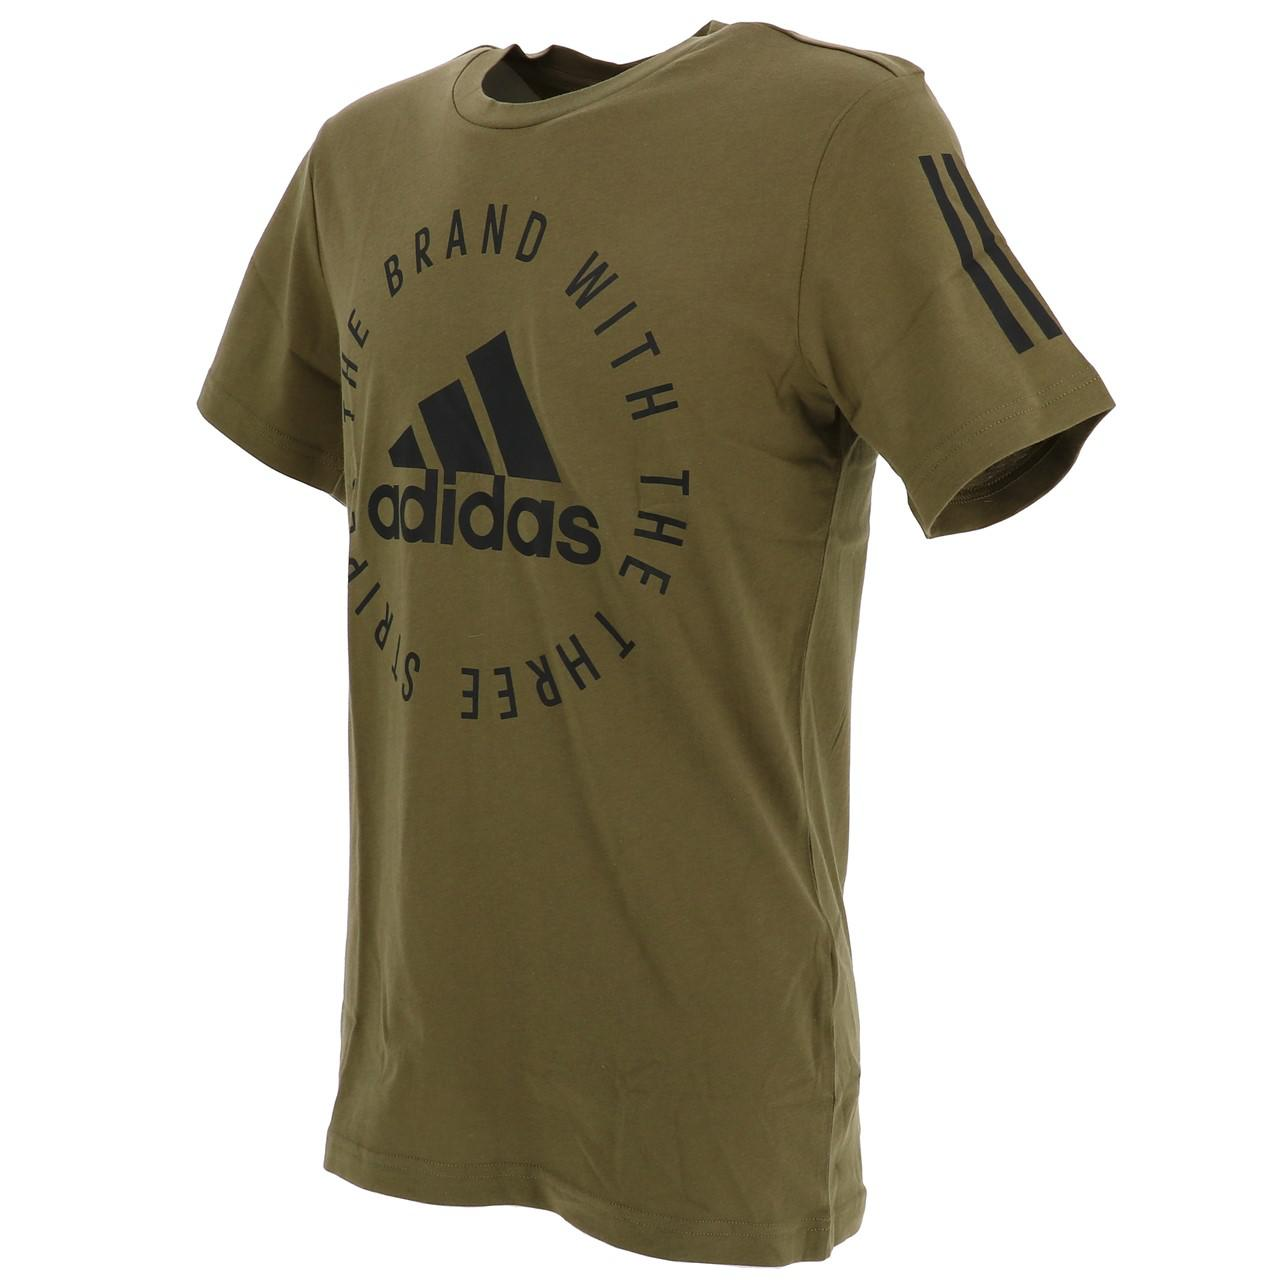 Short-Adidas-Sid-Khaki-Mc-Tee-Green-18234-New thumbnail 4